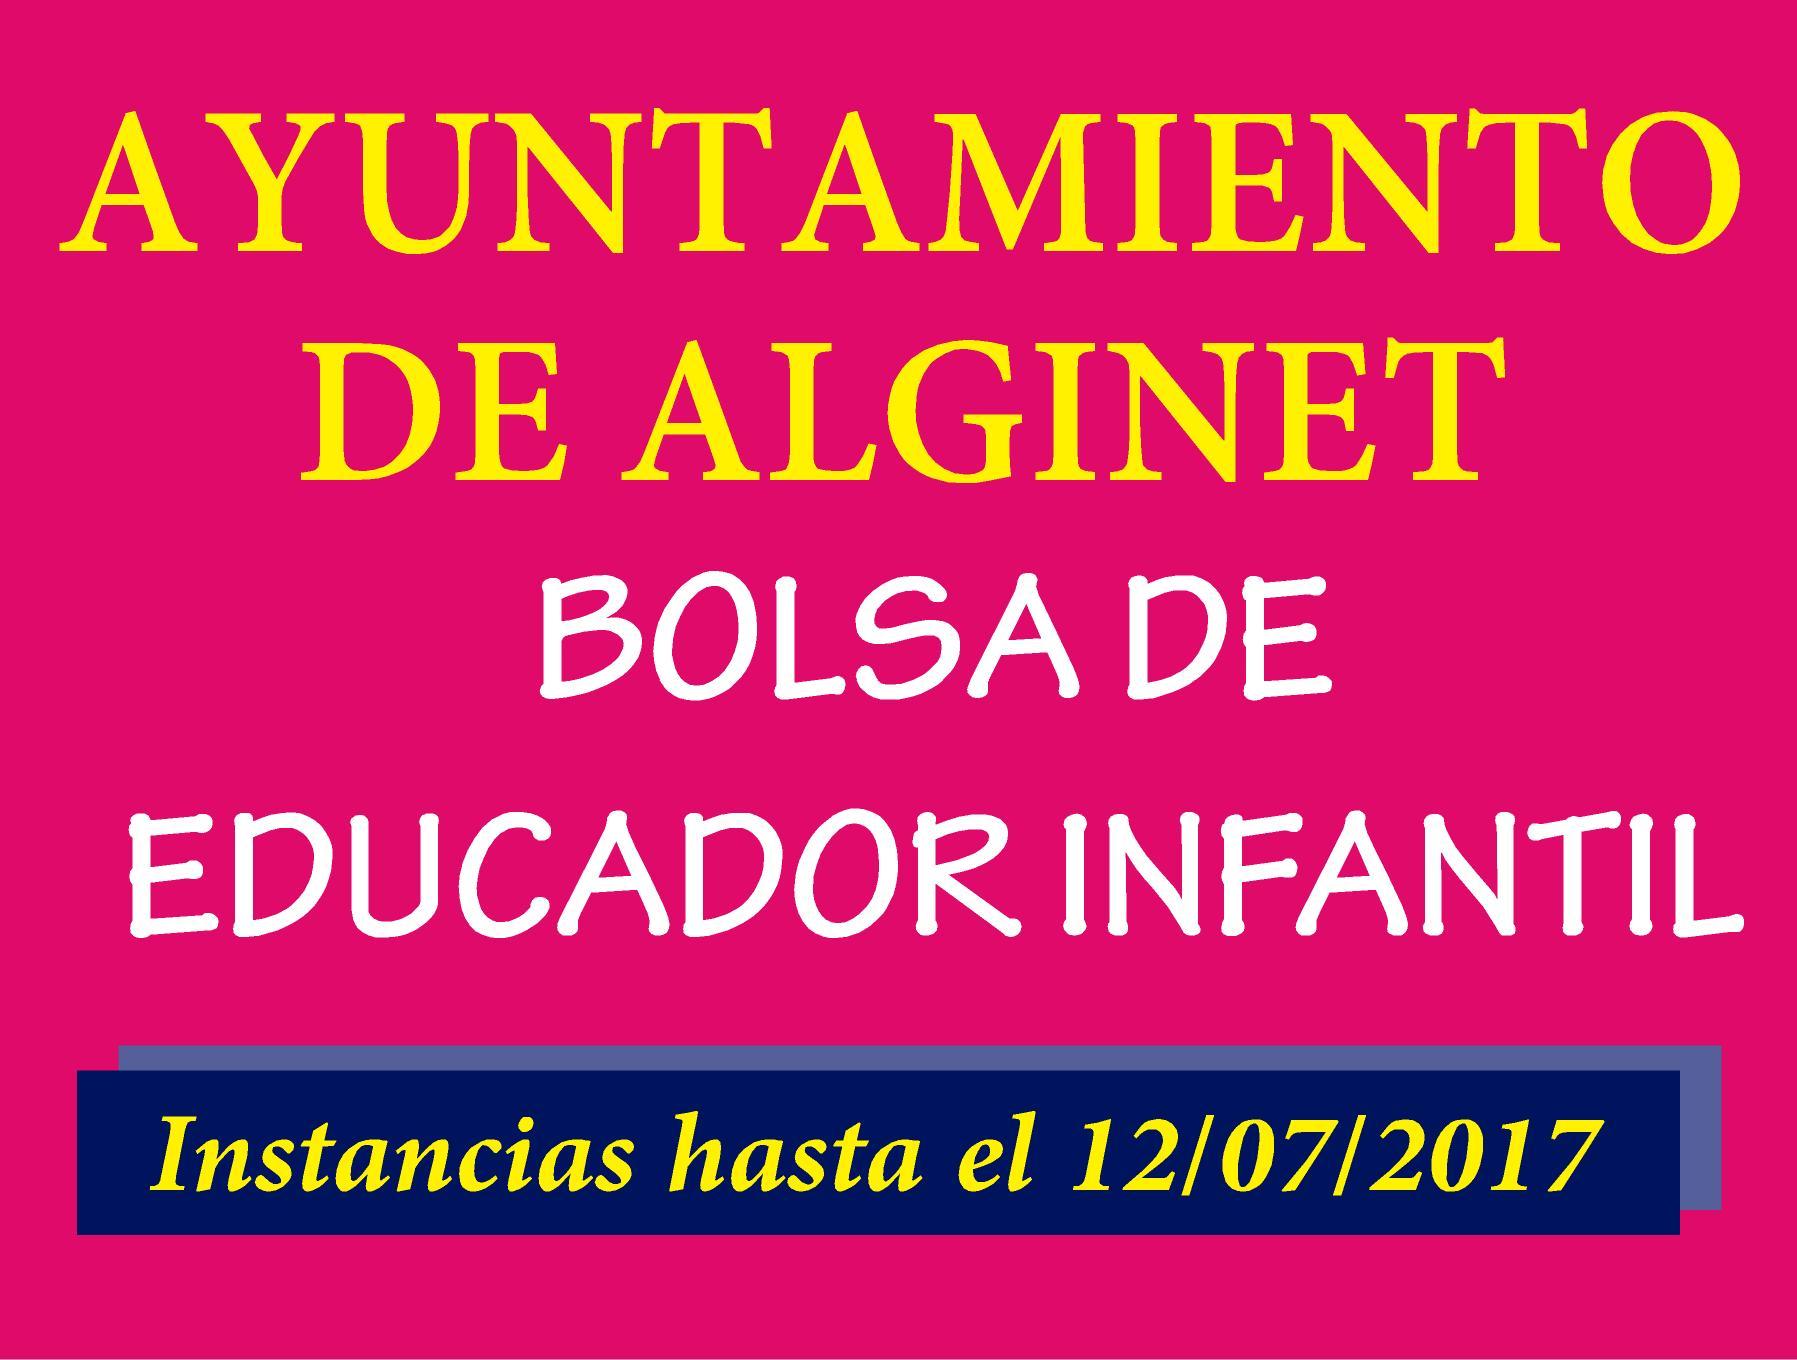 Ayuntamiento Alginet Bolsa Educador Infantil